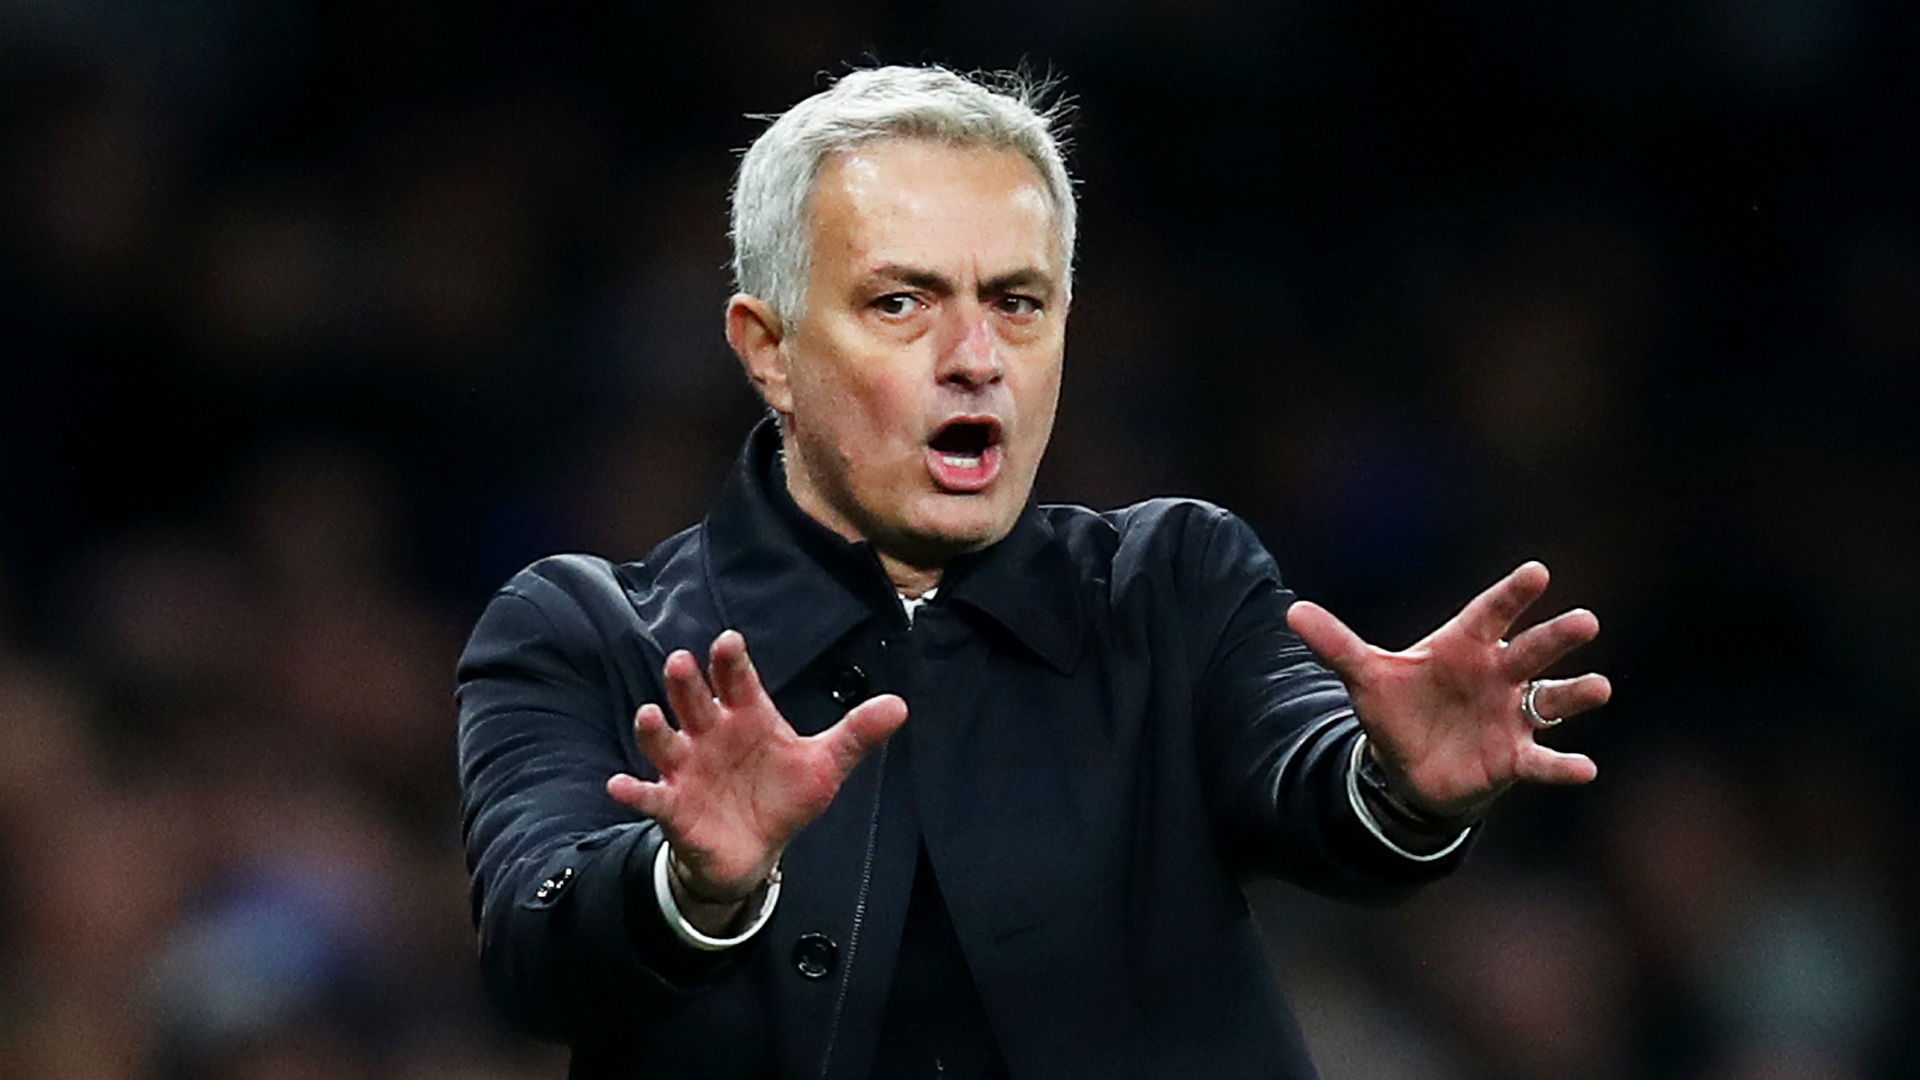 Alli scores brace to hand Mourinho 100% win